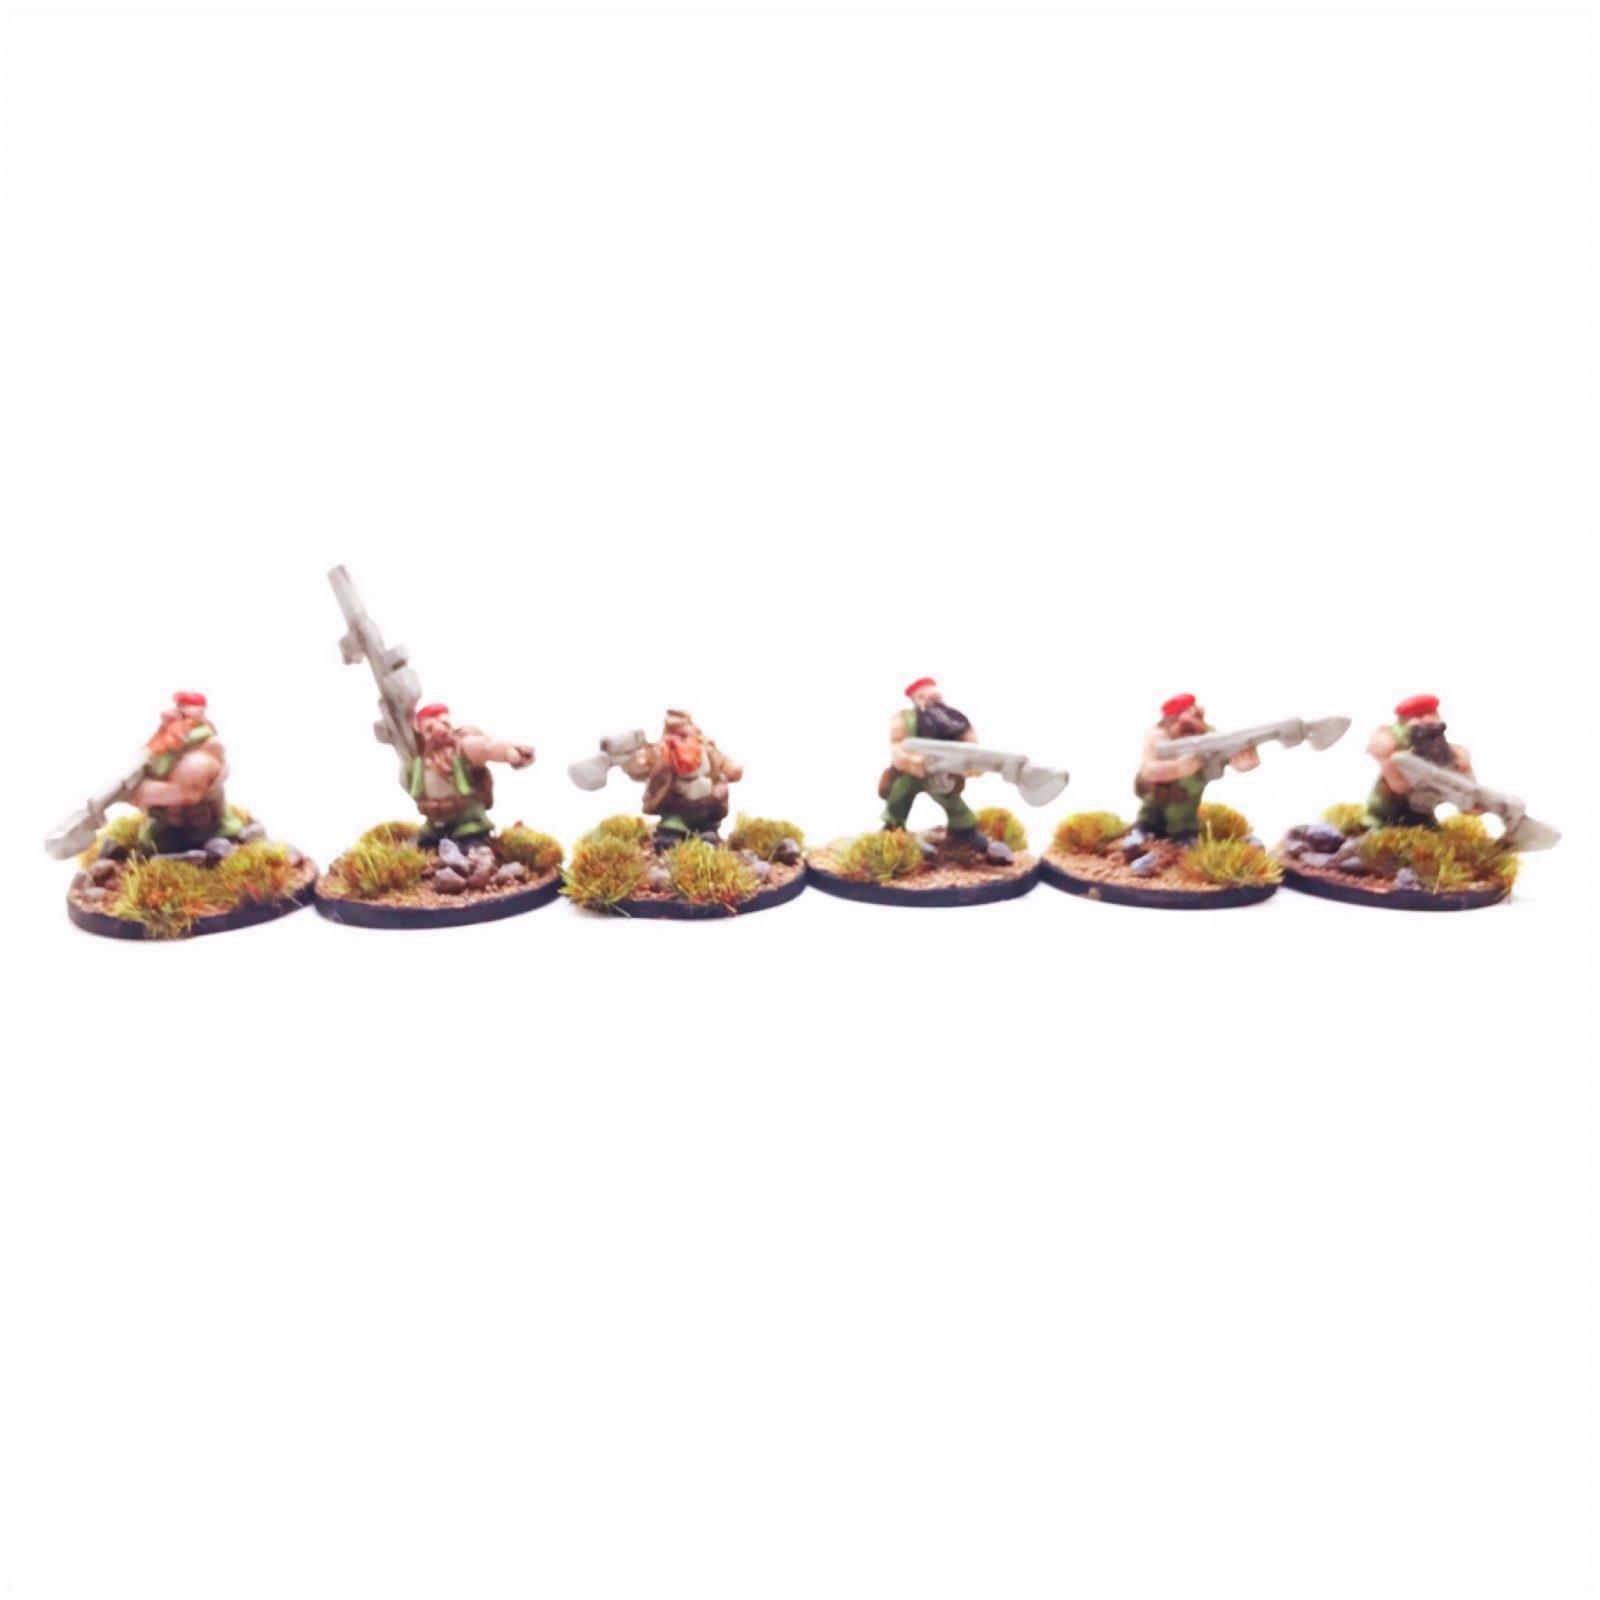 Dwarf Clansmen Command – Pack 2